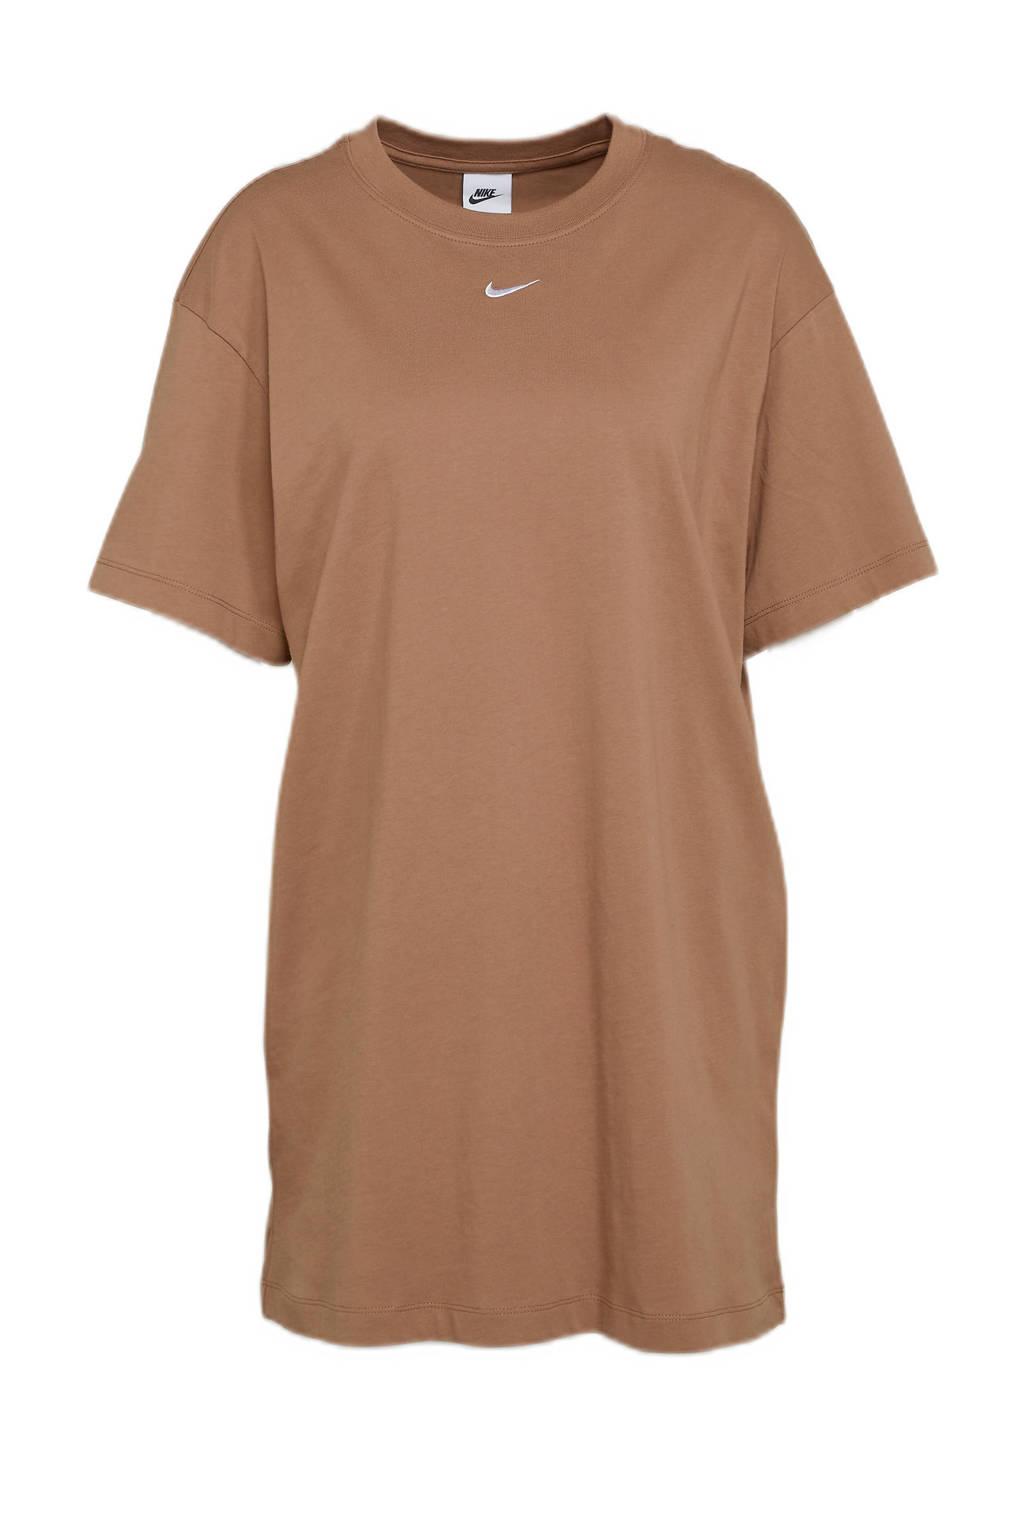 Nike jurk bruin, Bruin